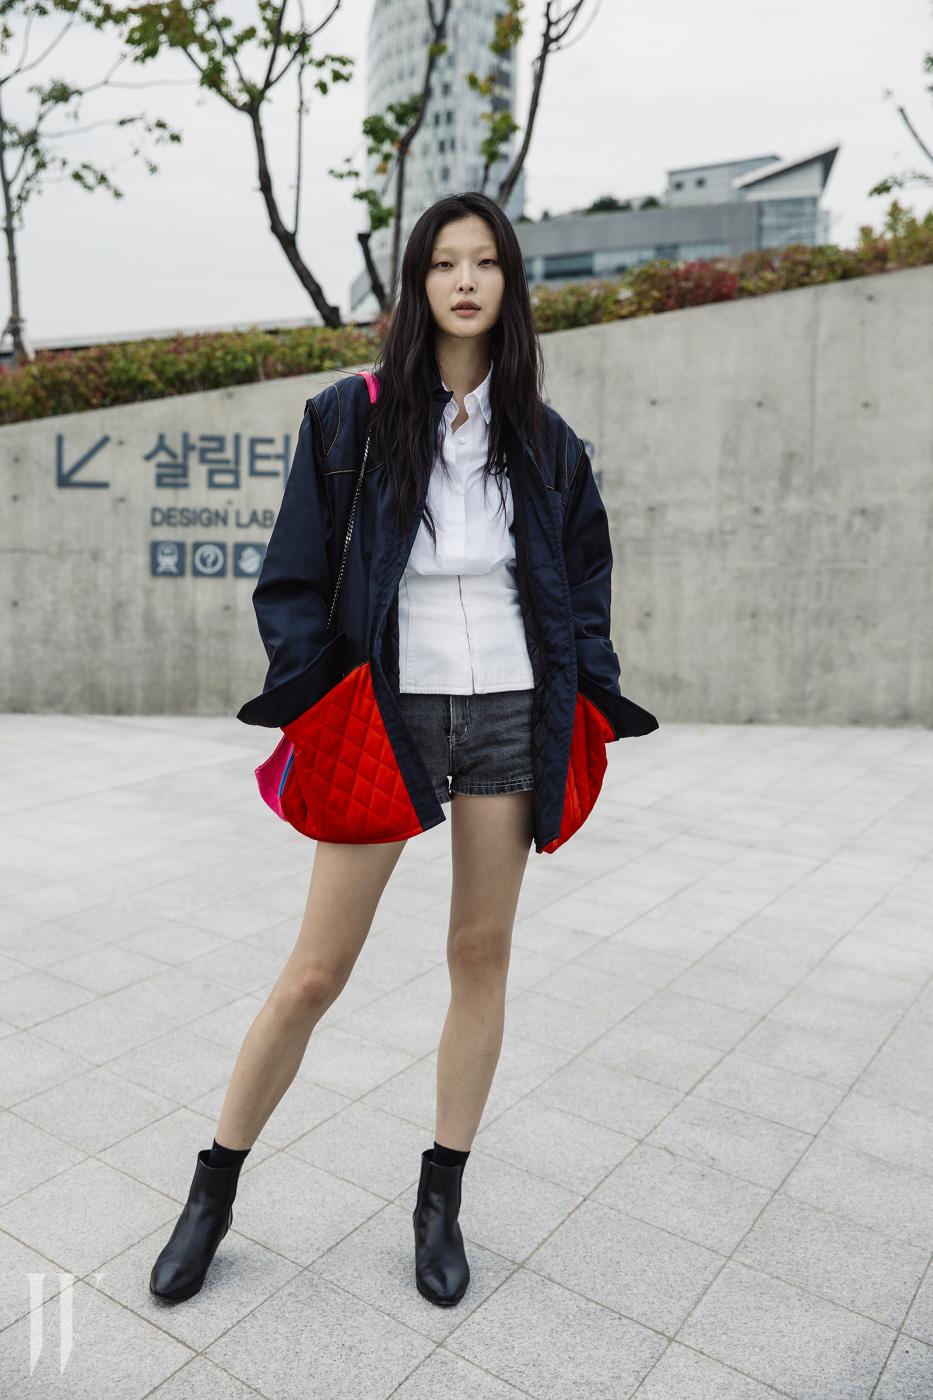 sunghee